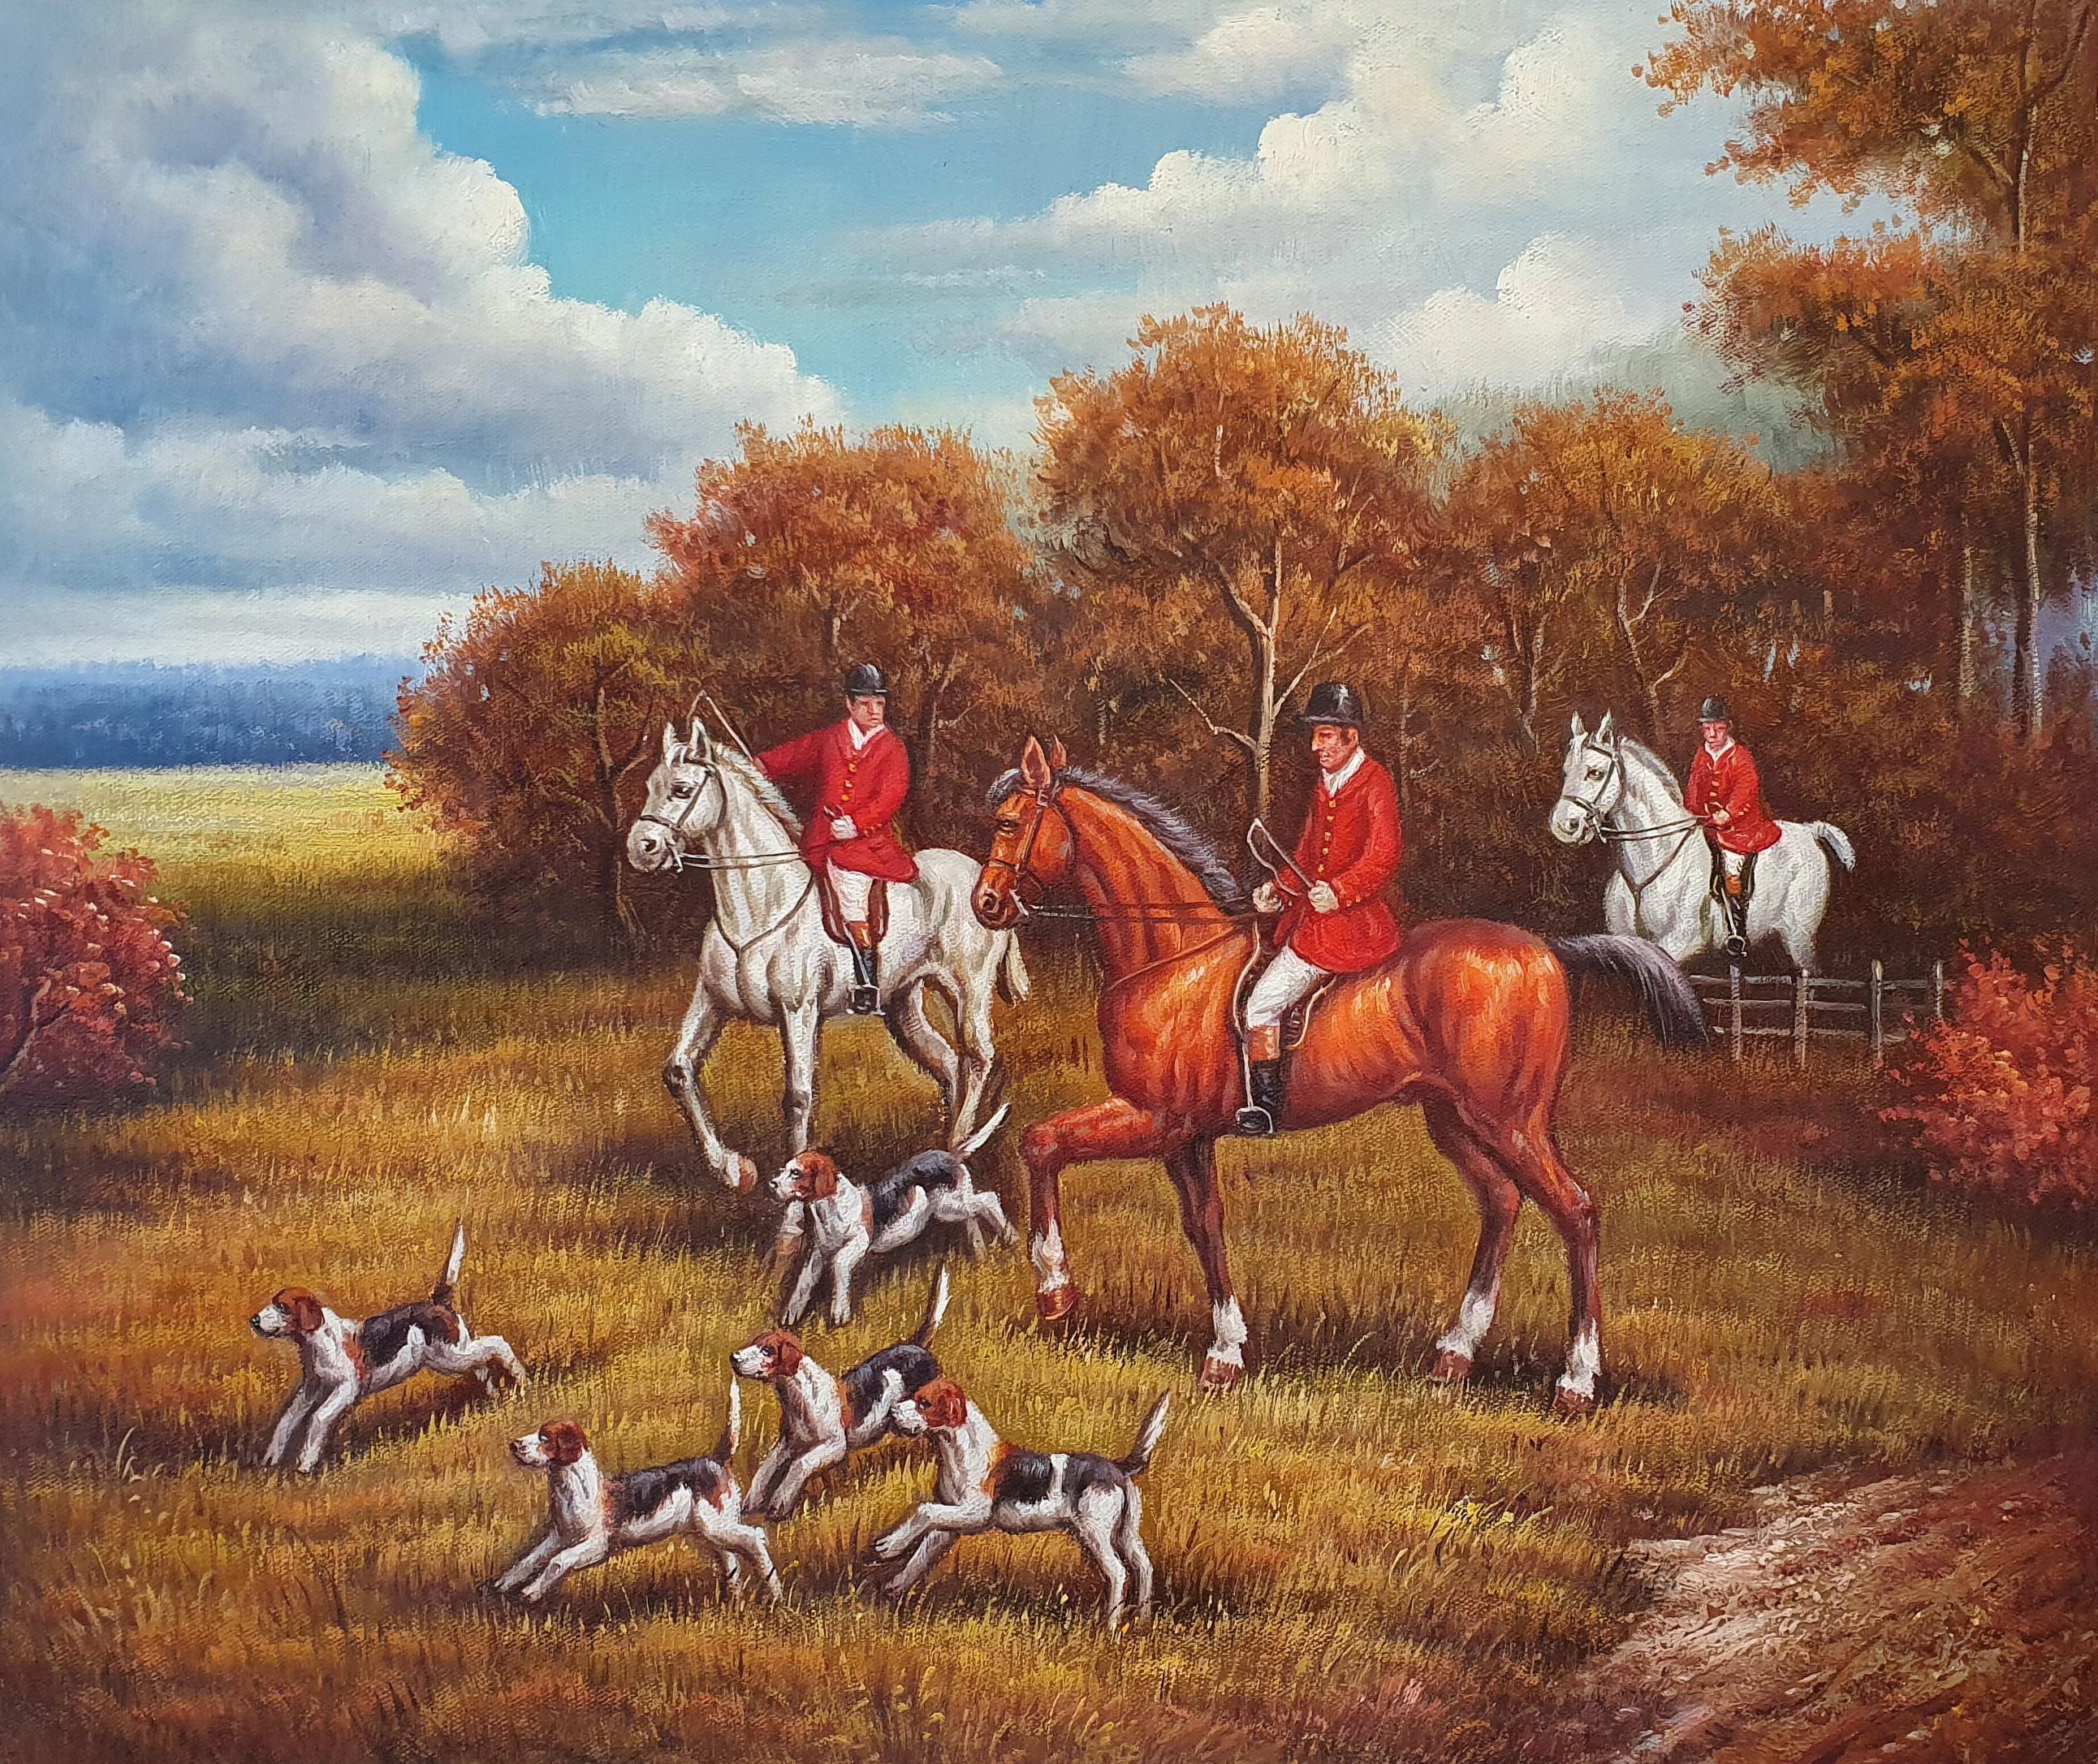 Натюрморт «Английская охота» картина 50х60 арт. 5р058